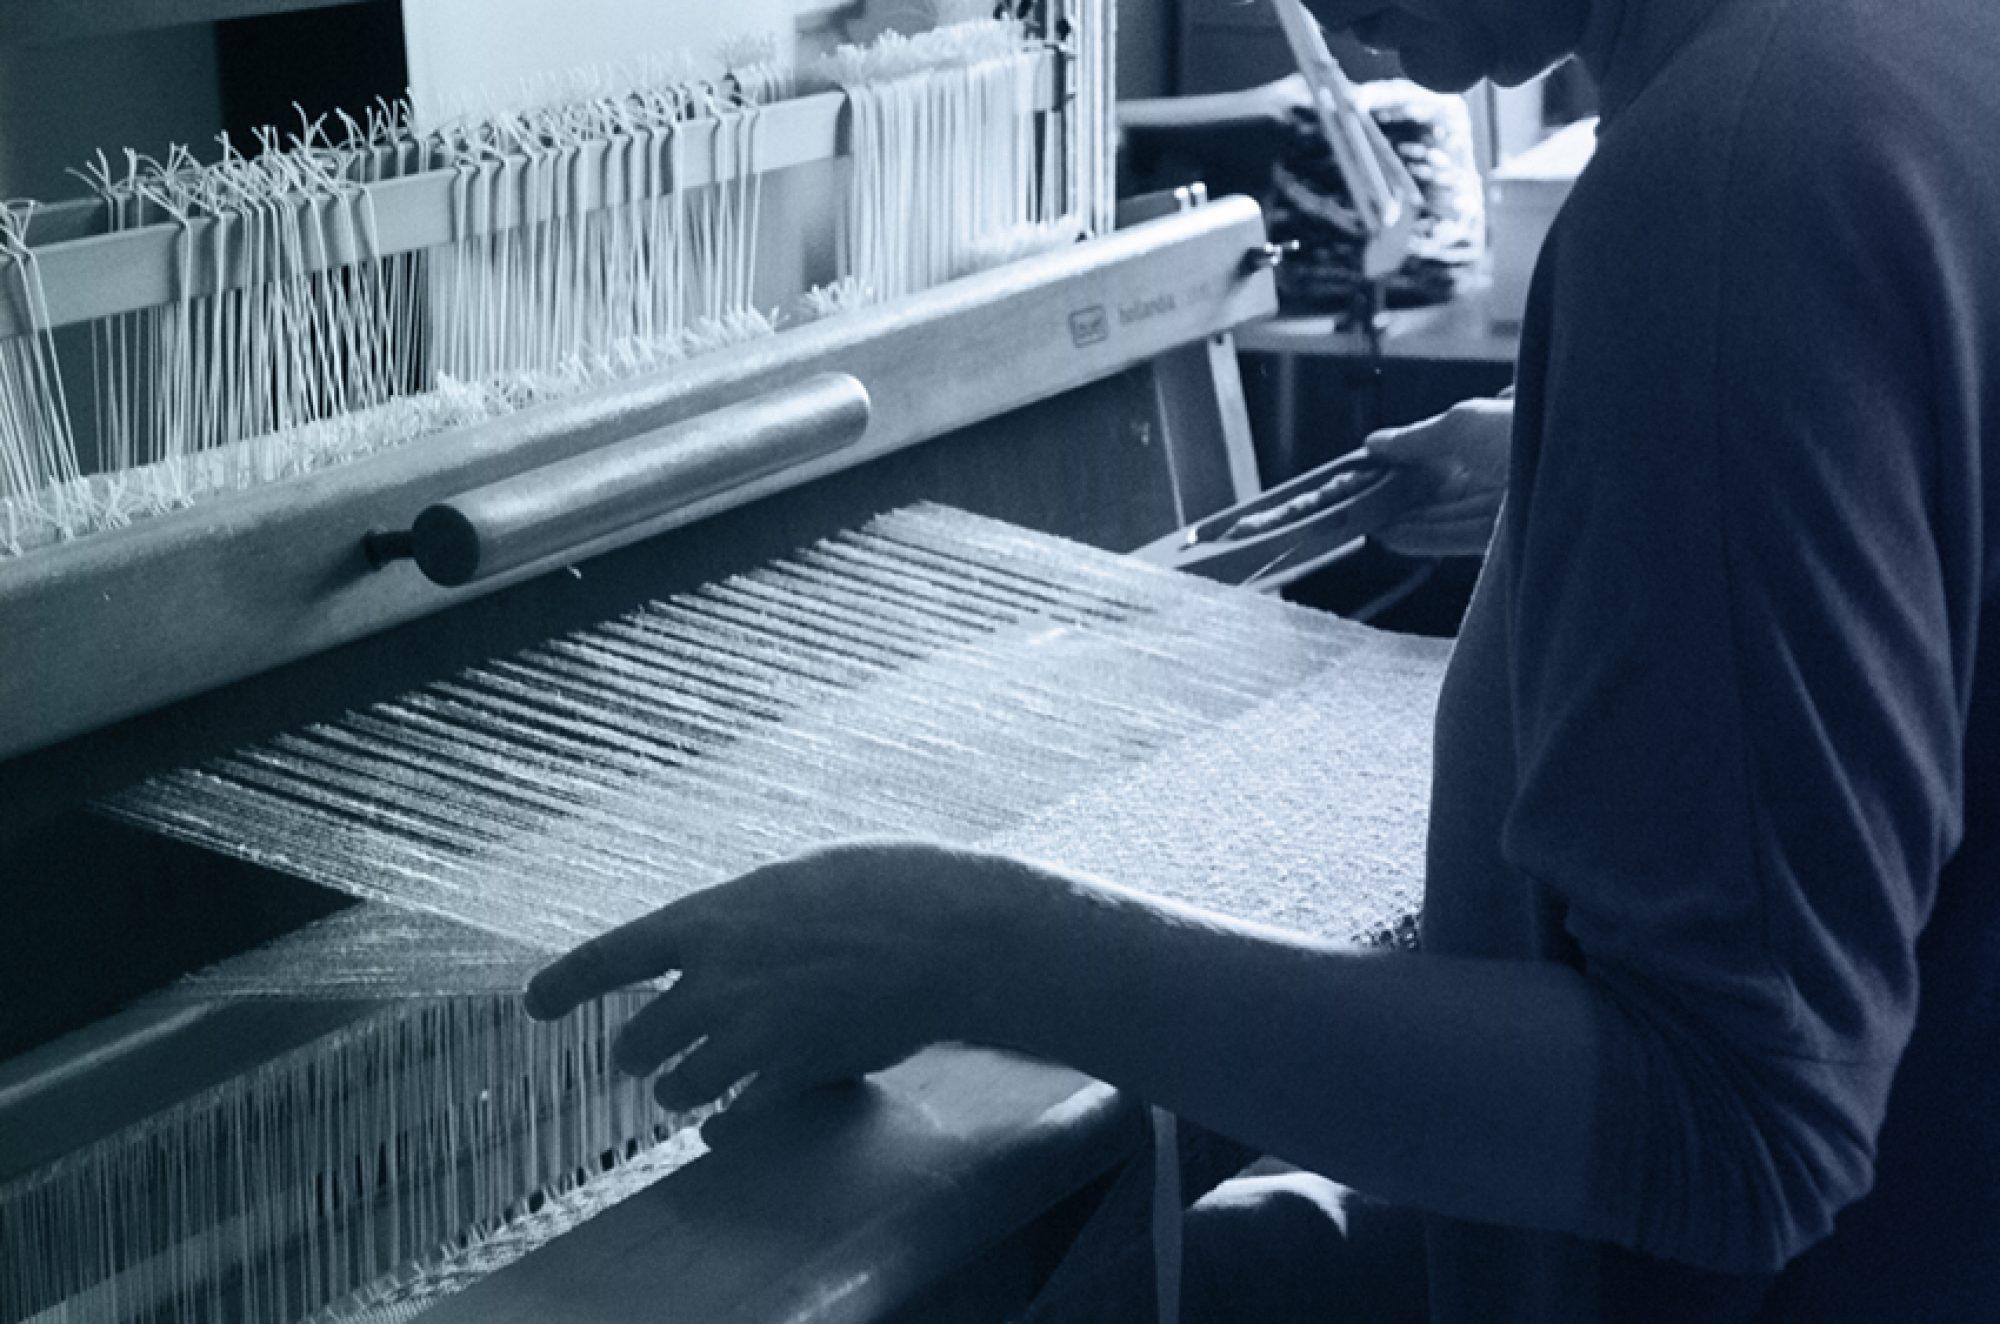 Ulita's loom